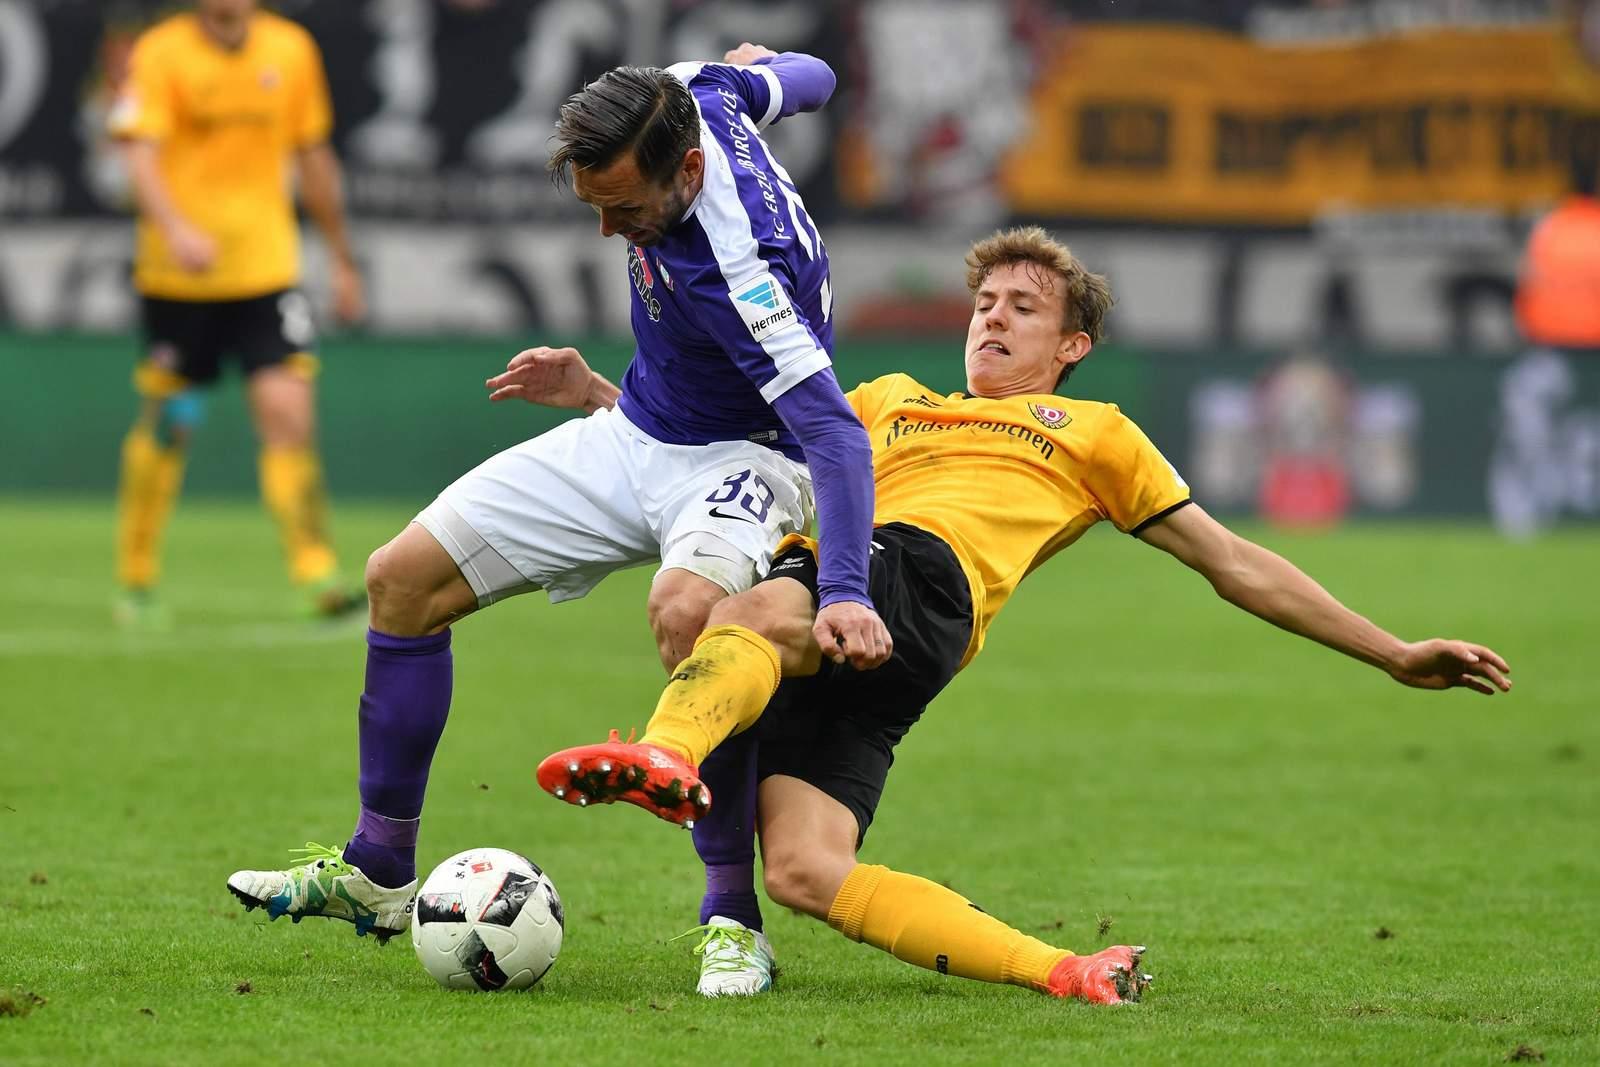 Niklas Hauptmann grätscht gegen Christian Tiffert. Jetzt auf Dynamo Dresden gegen Erzgebirge Aue wetten!